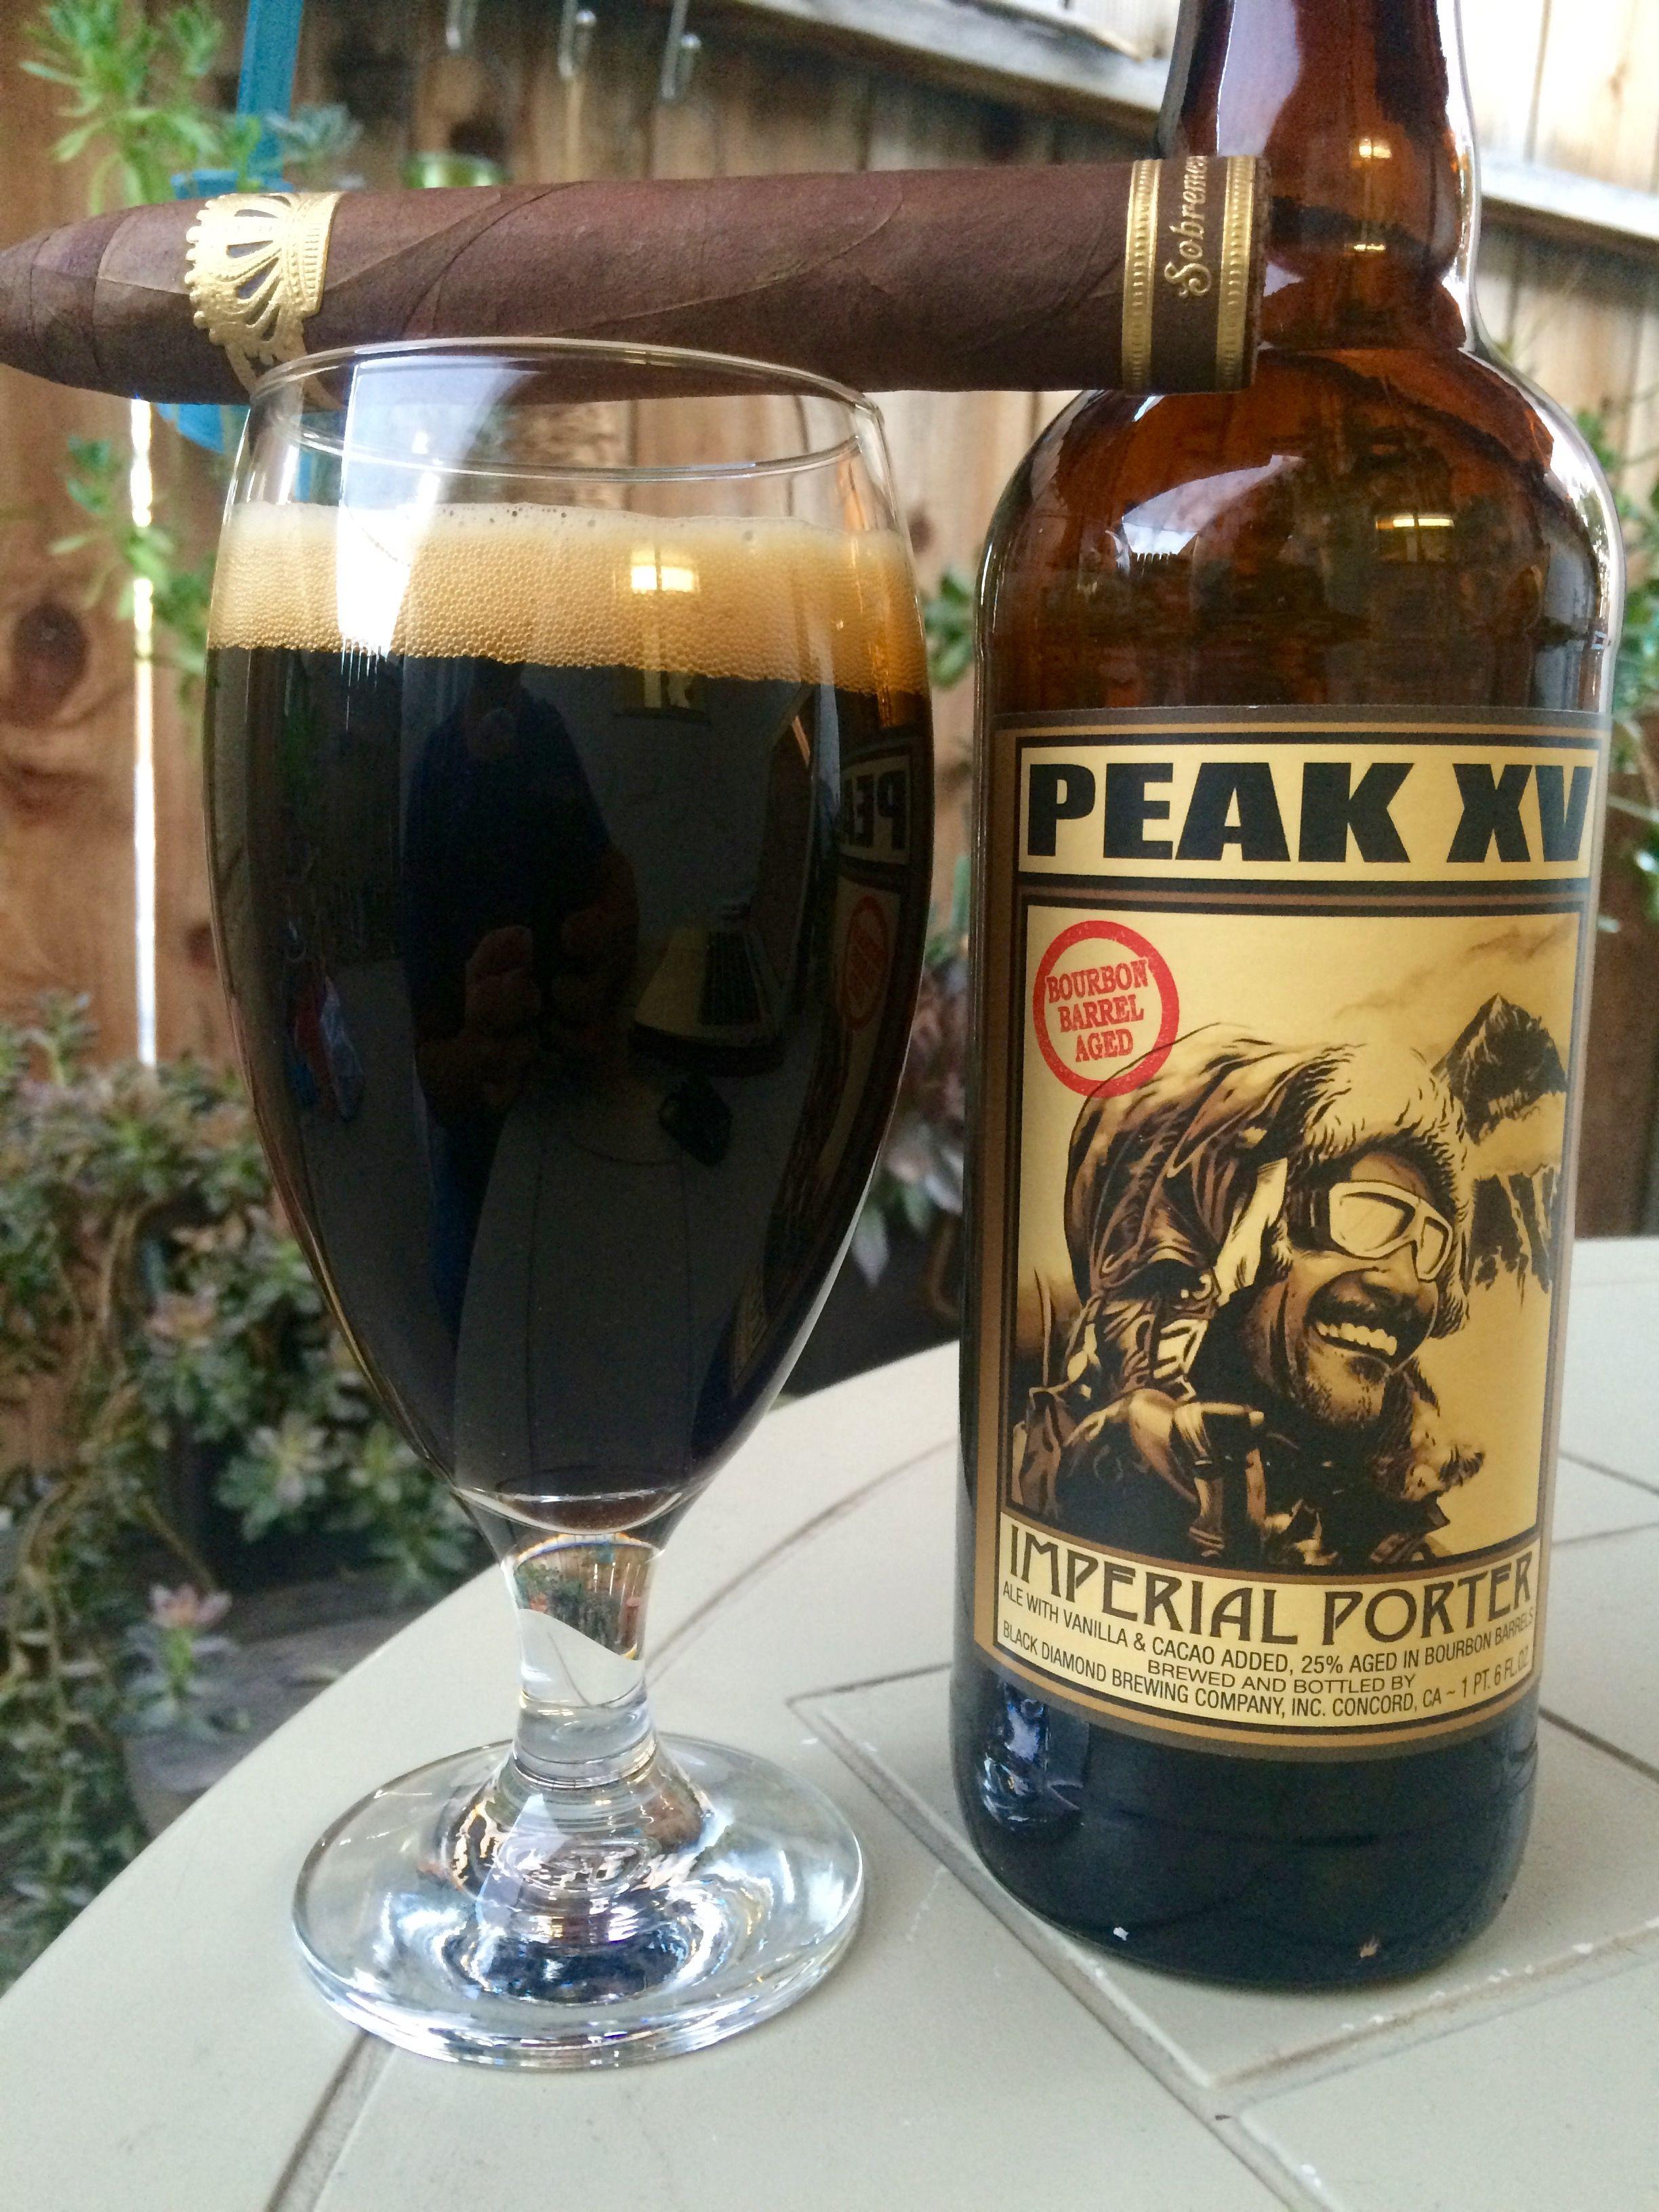 Hasil gambar untuk Bourbon Barrel Peak XV